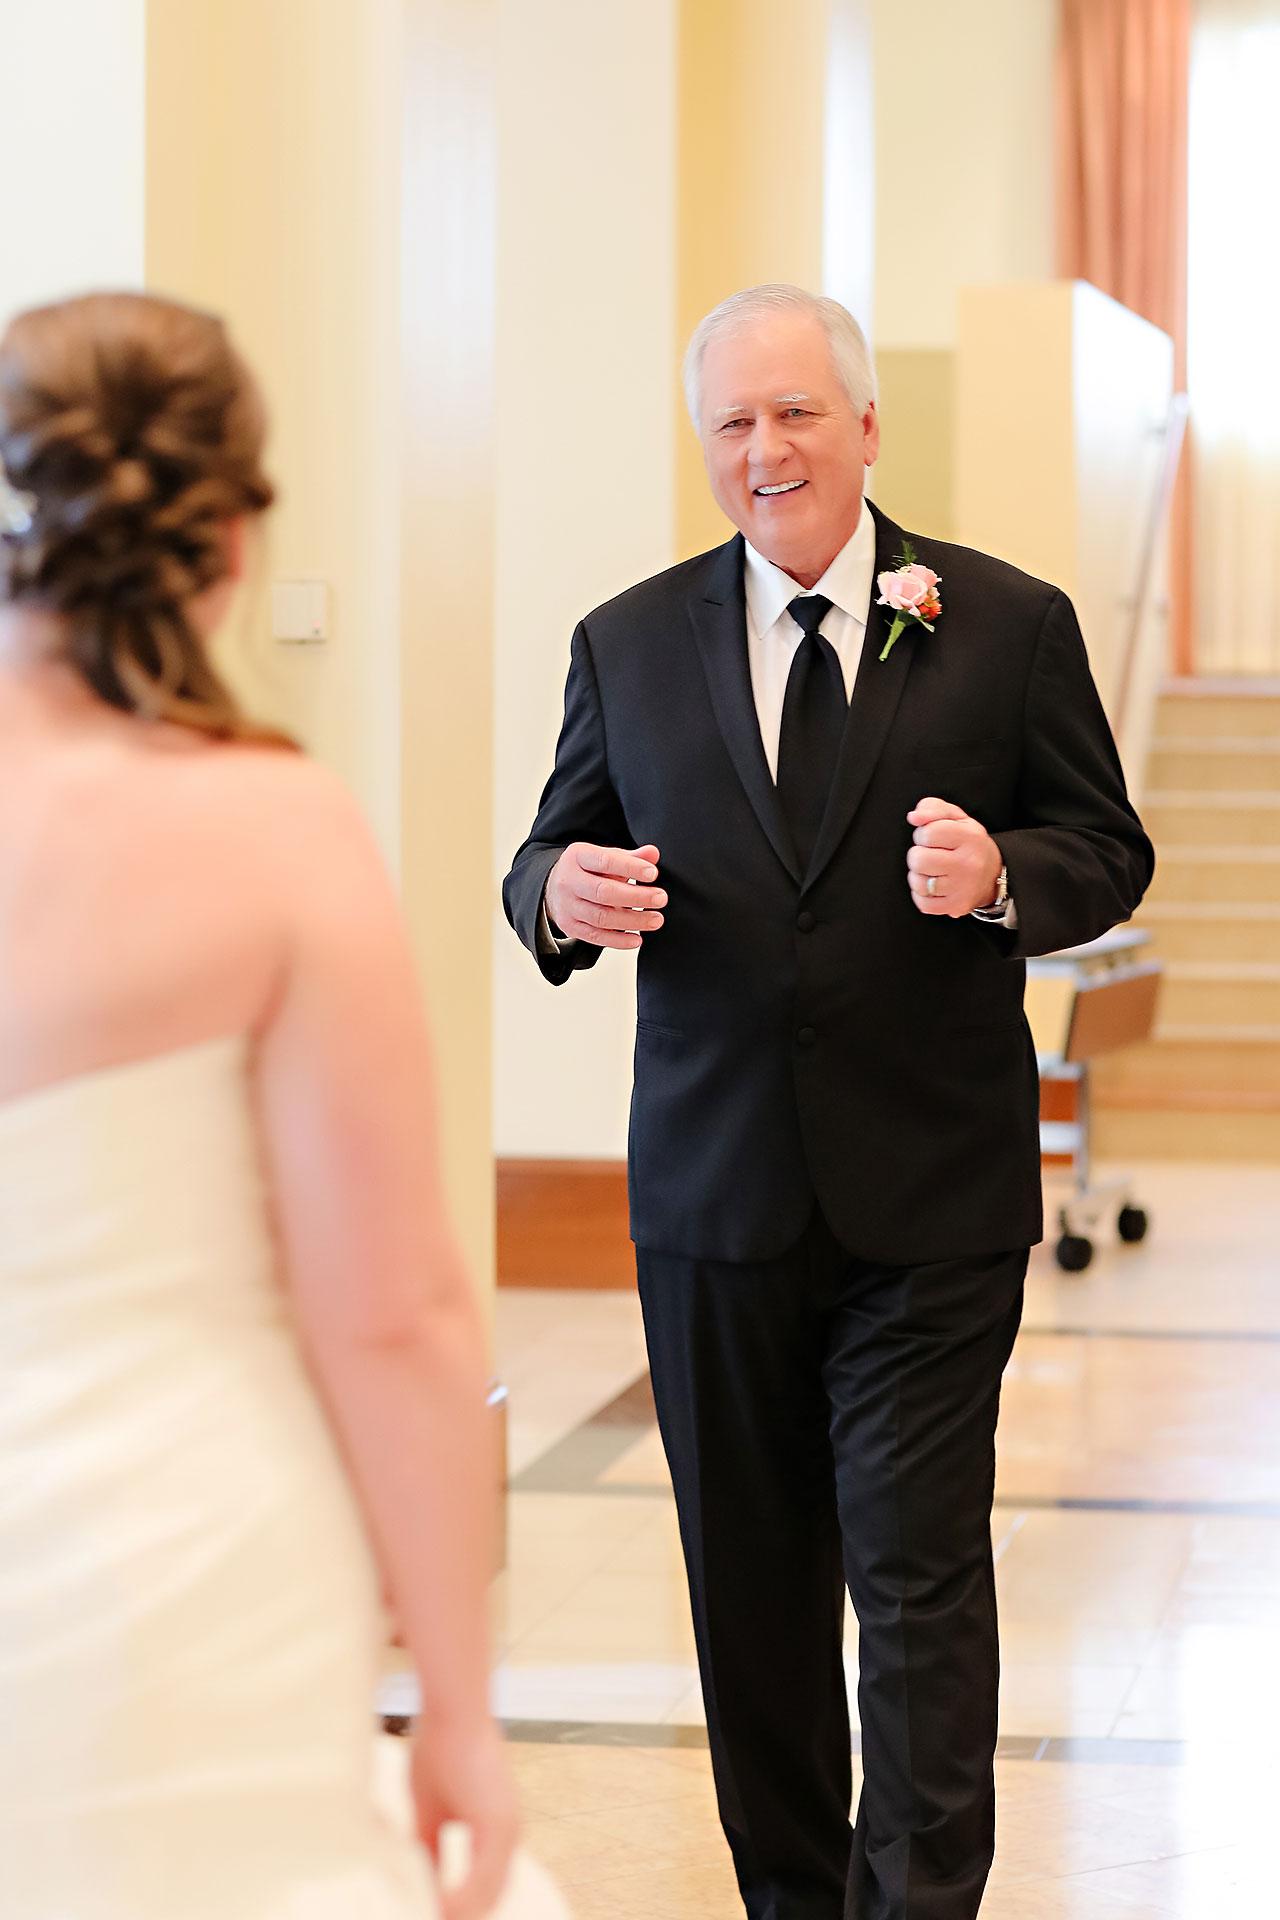 Erin John Artsgarden Indianapolis Wedding 042